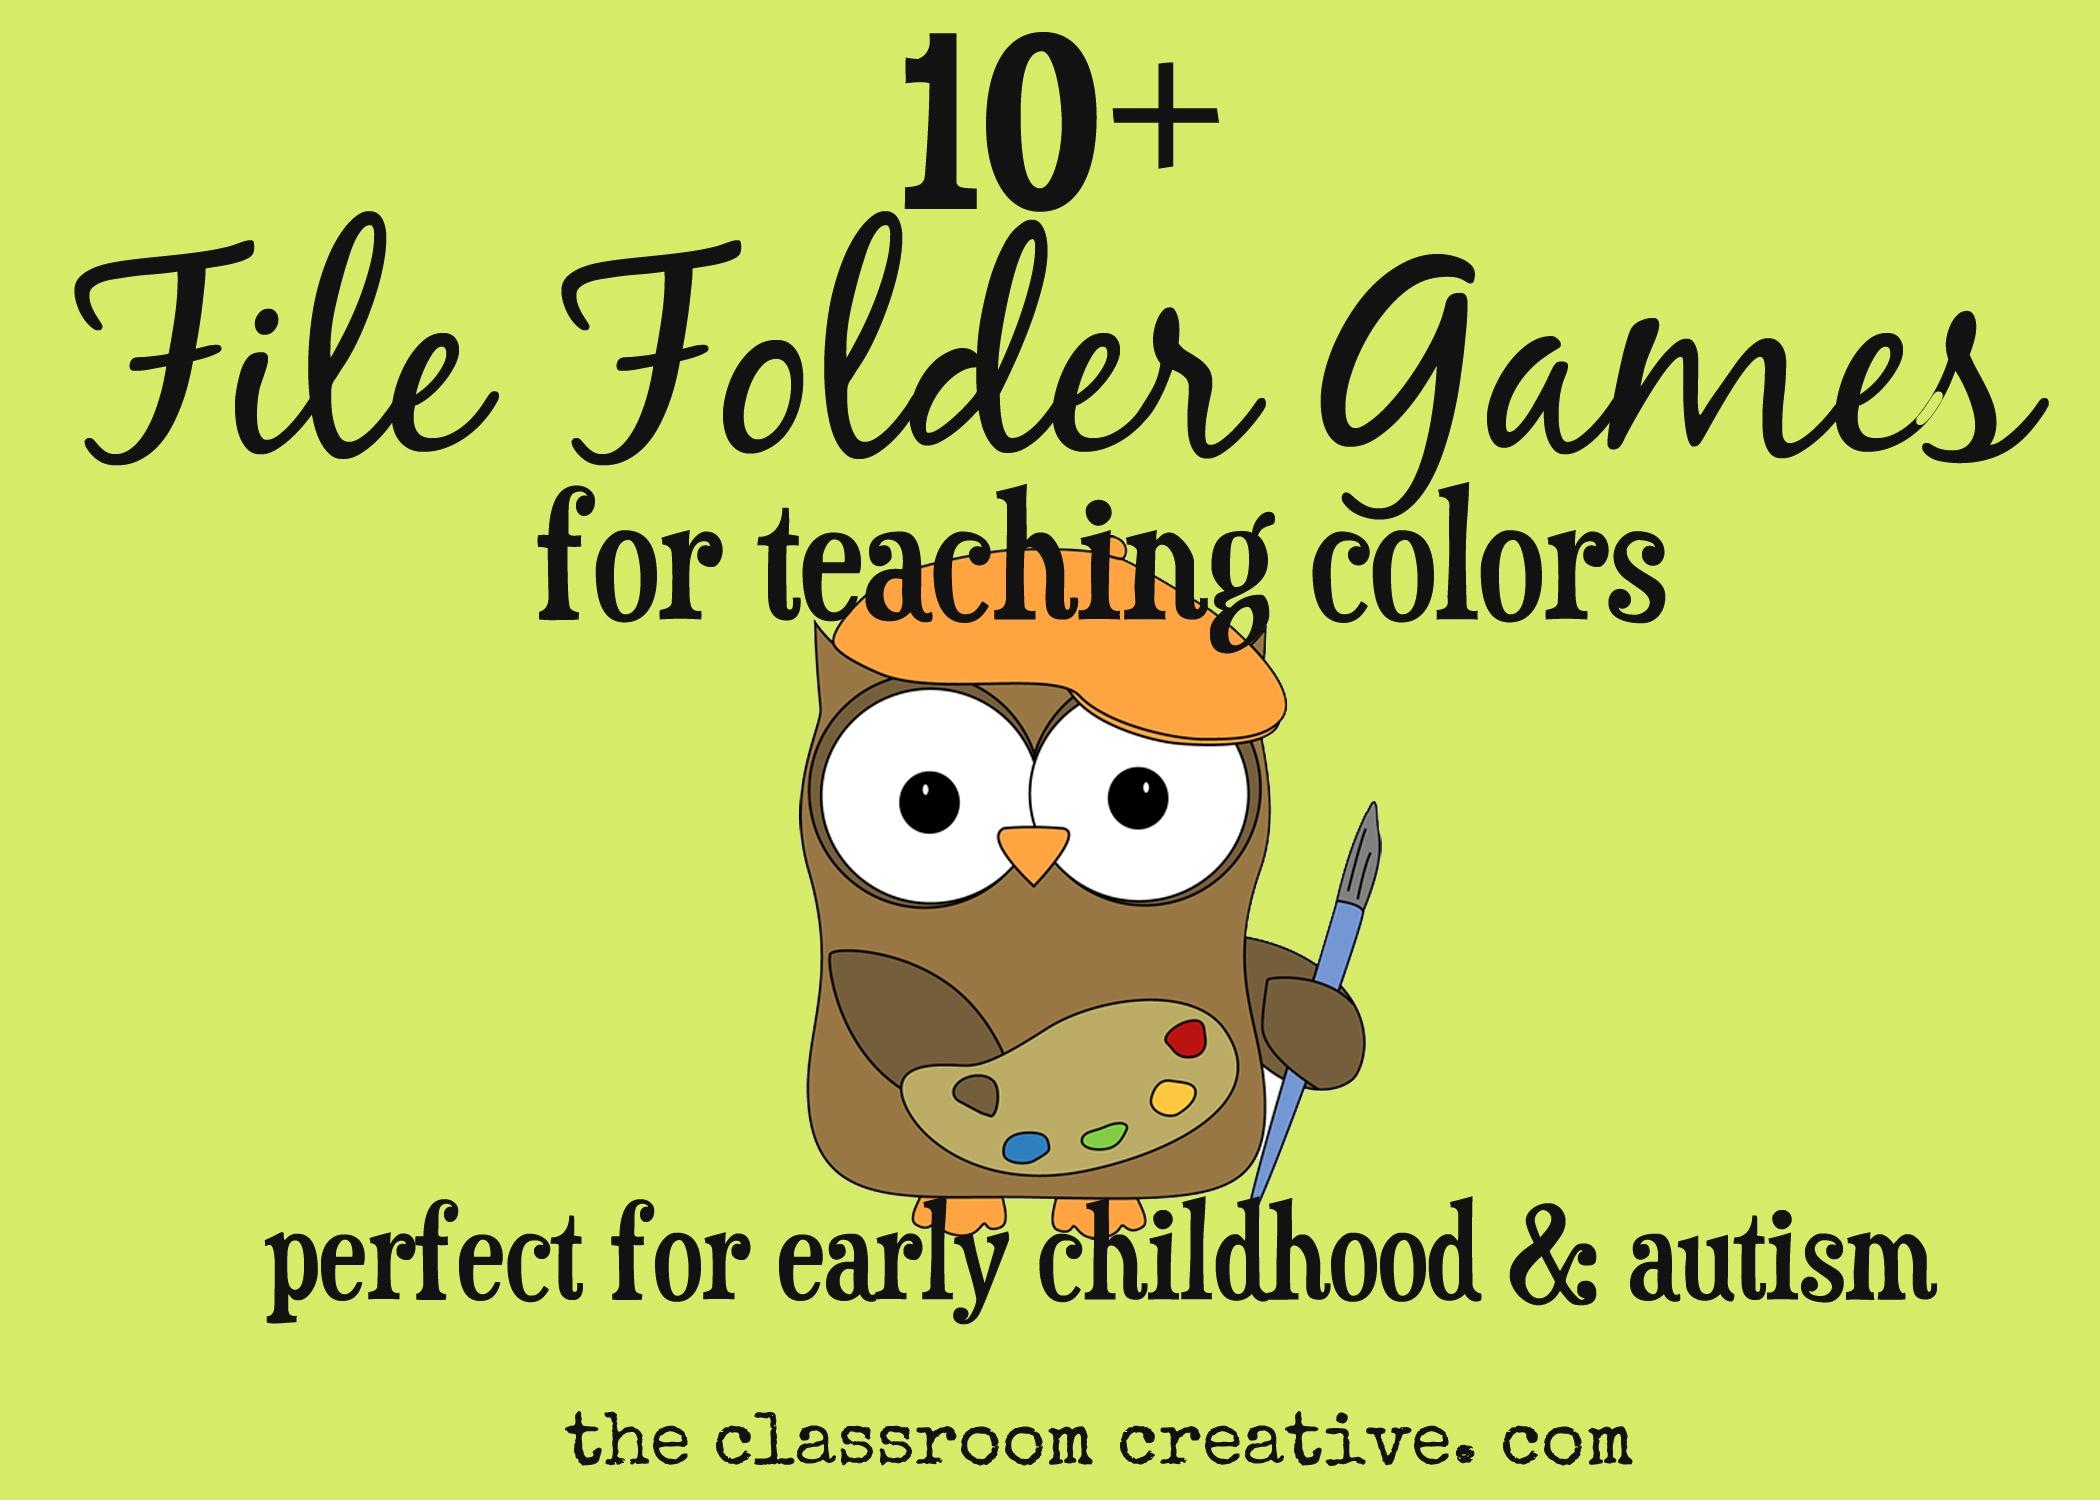 File Folder Games For Teaching Colors - Free Printable File Folders For Preschoolers